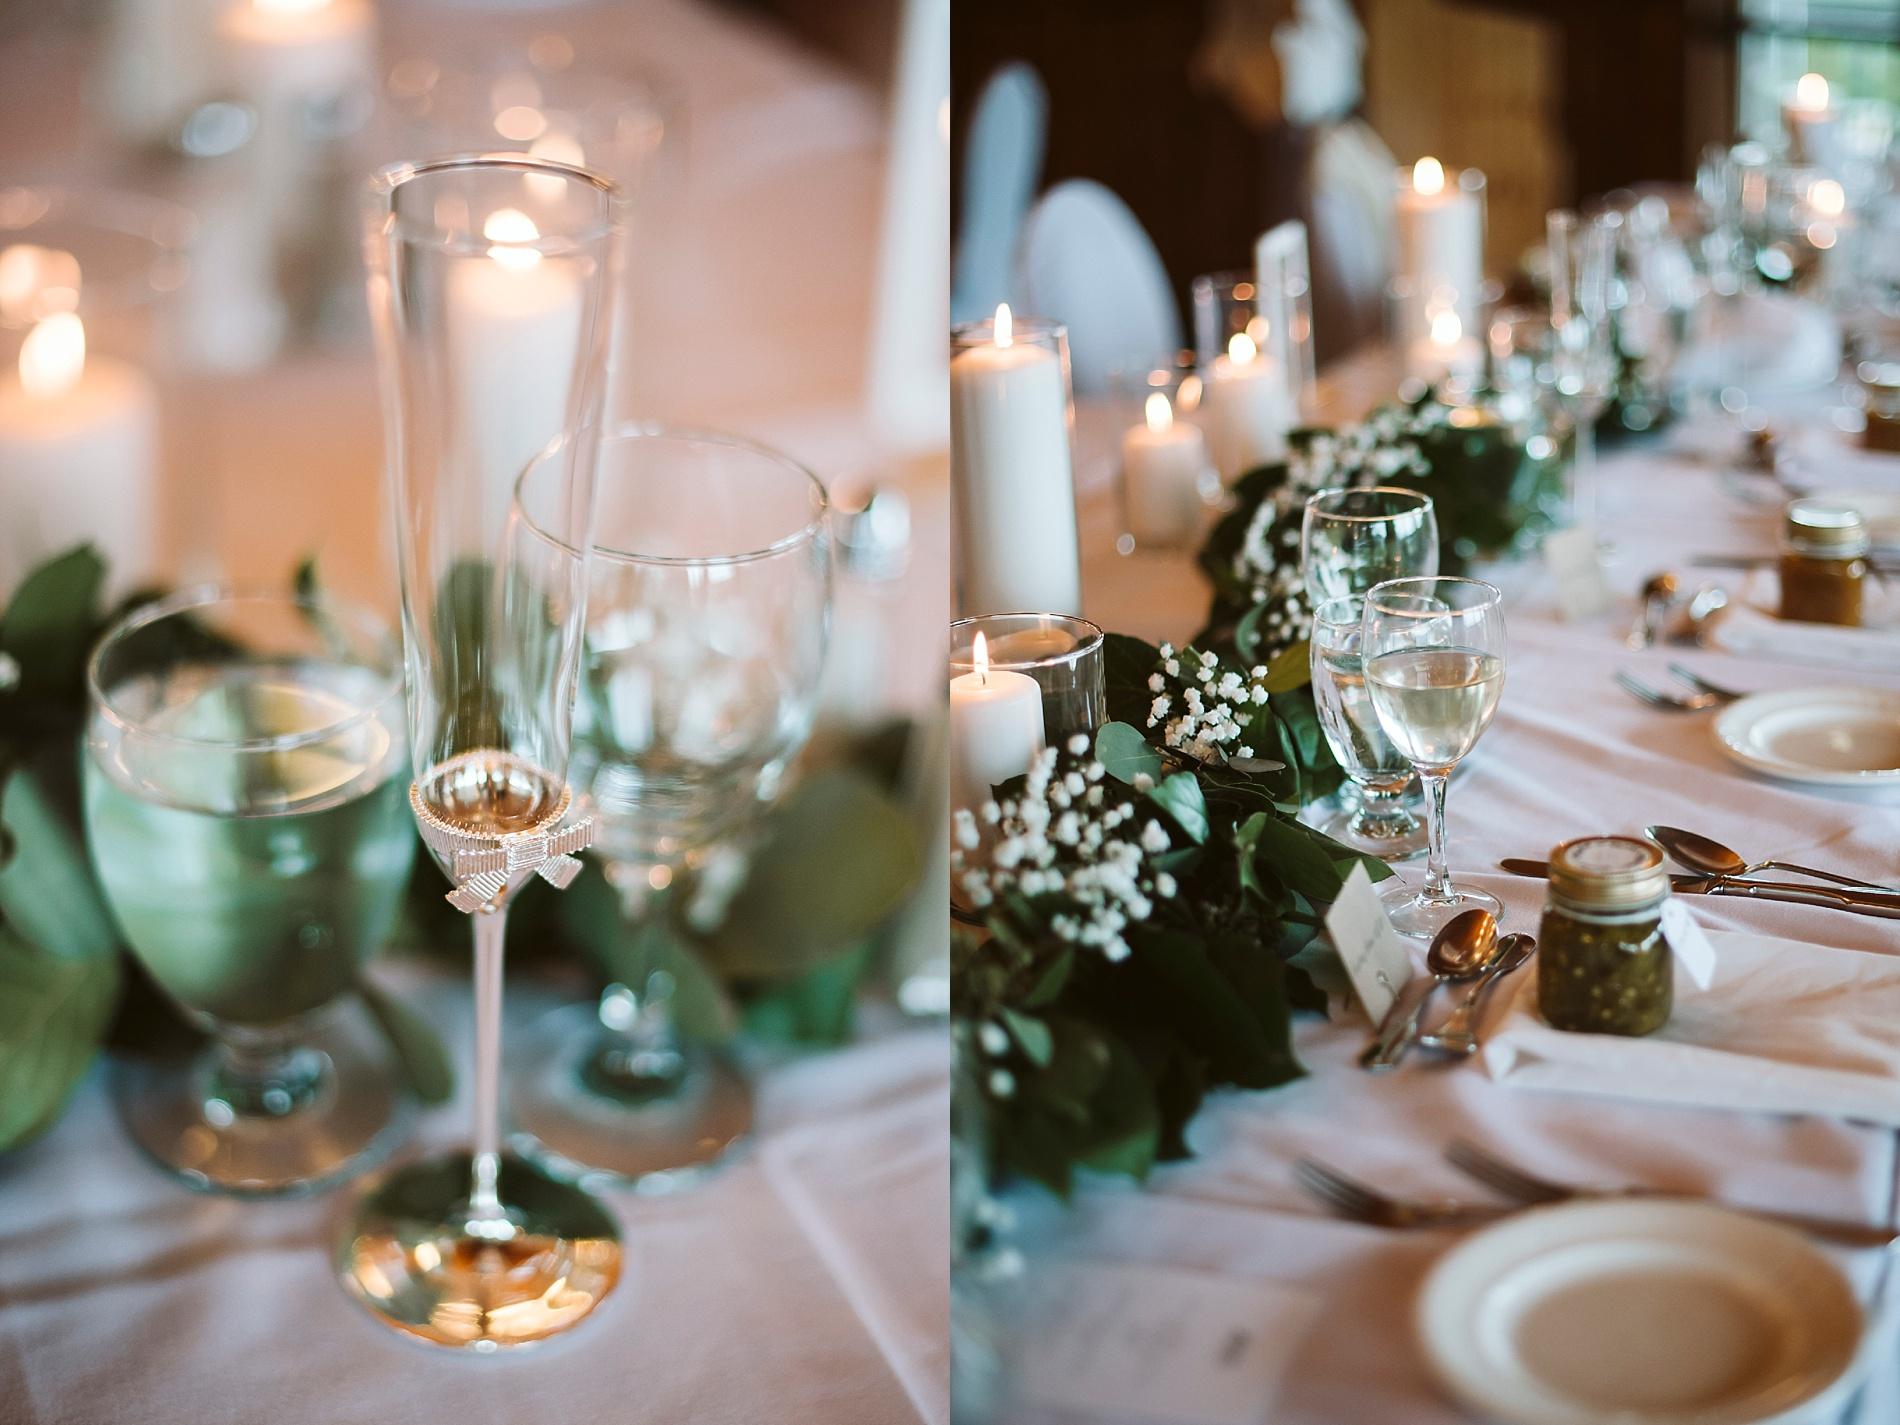 Kawartha_Lakes_Wedding_Bobcageon_Eganridge_Resort_Toronto_Photographer_0068.jpg